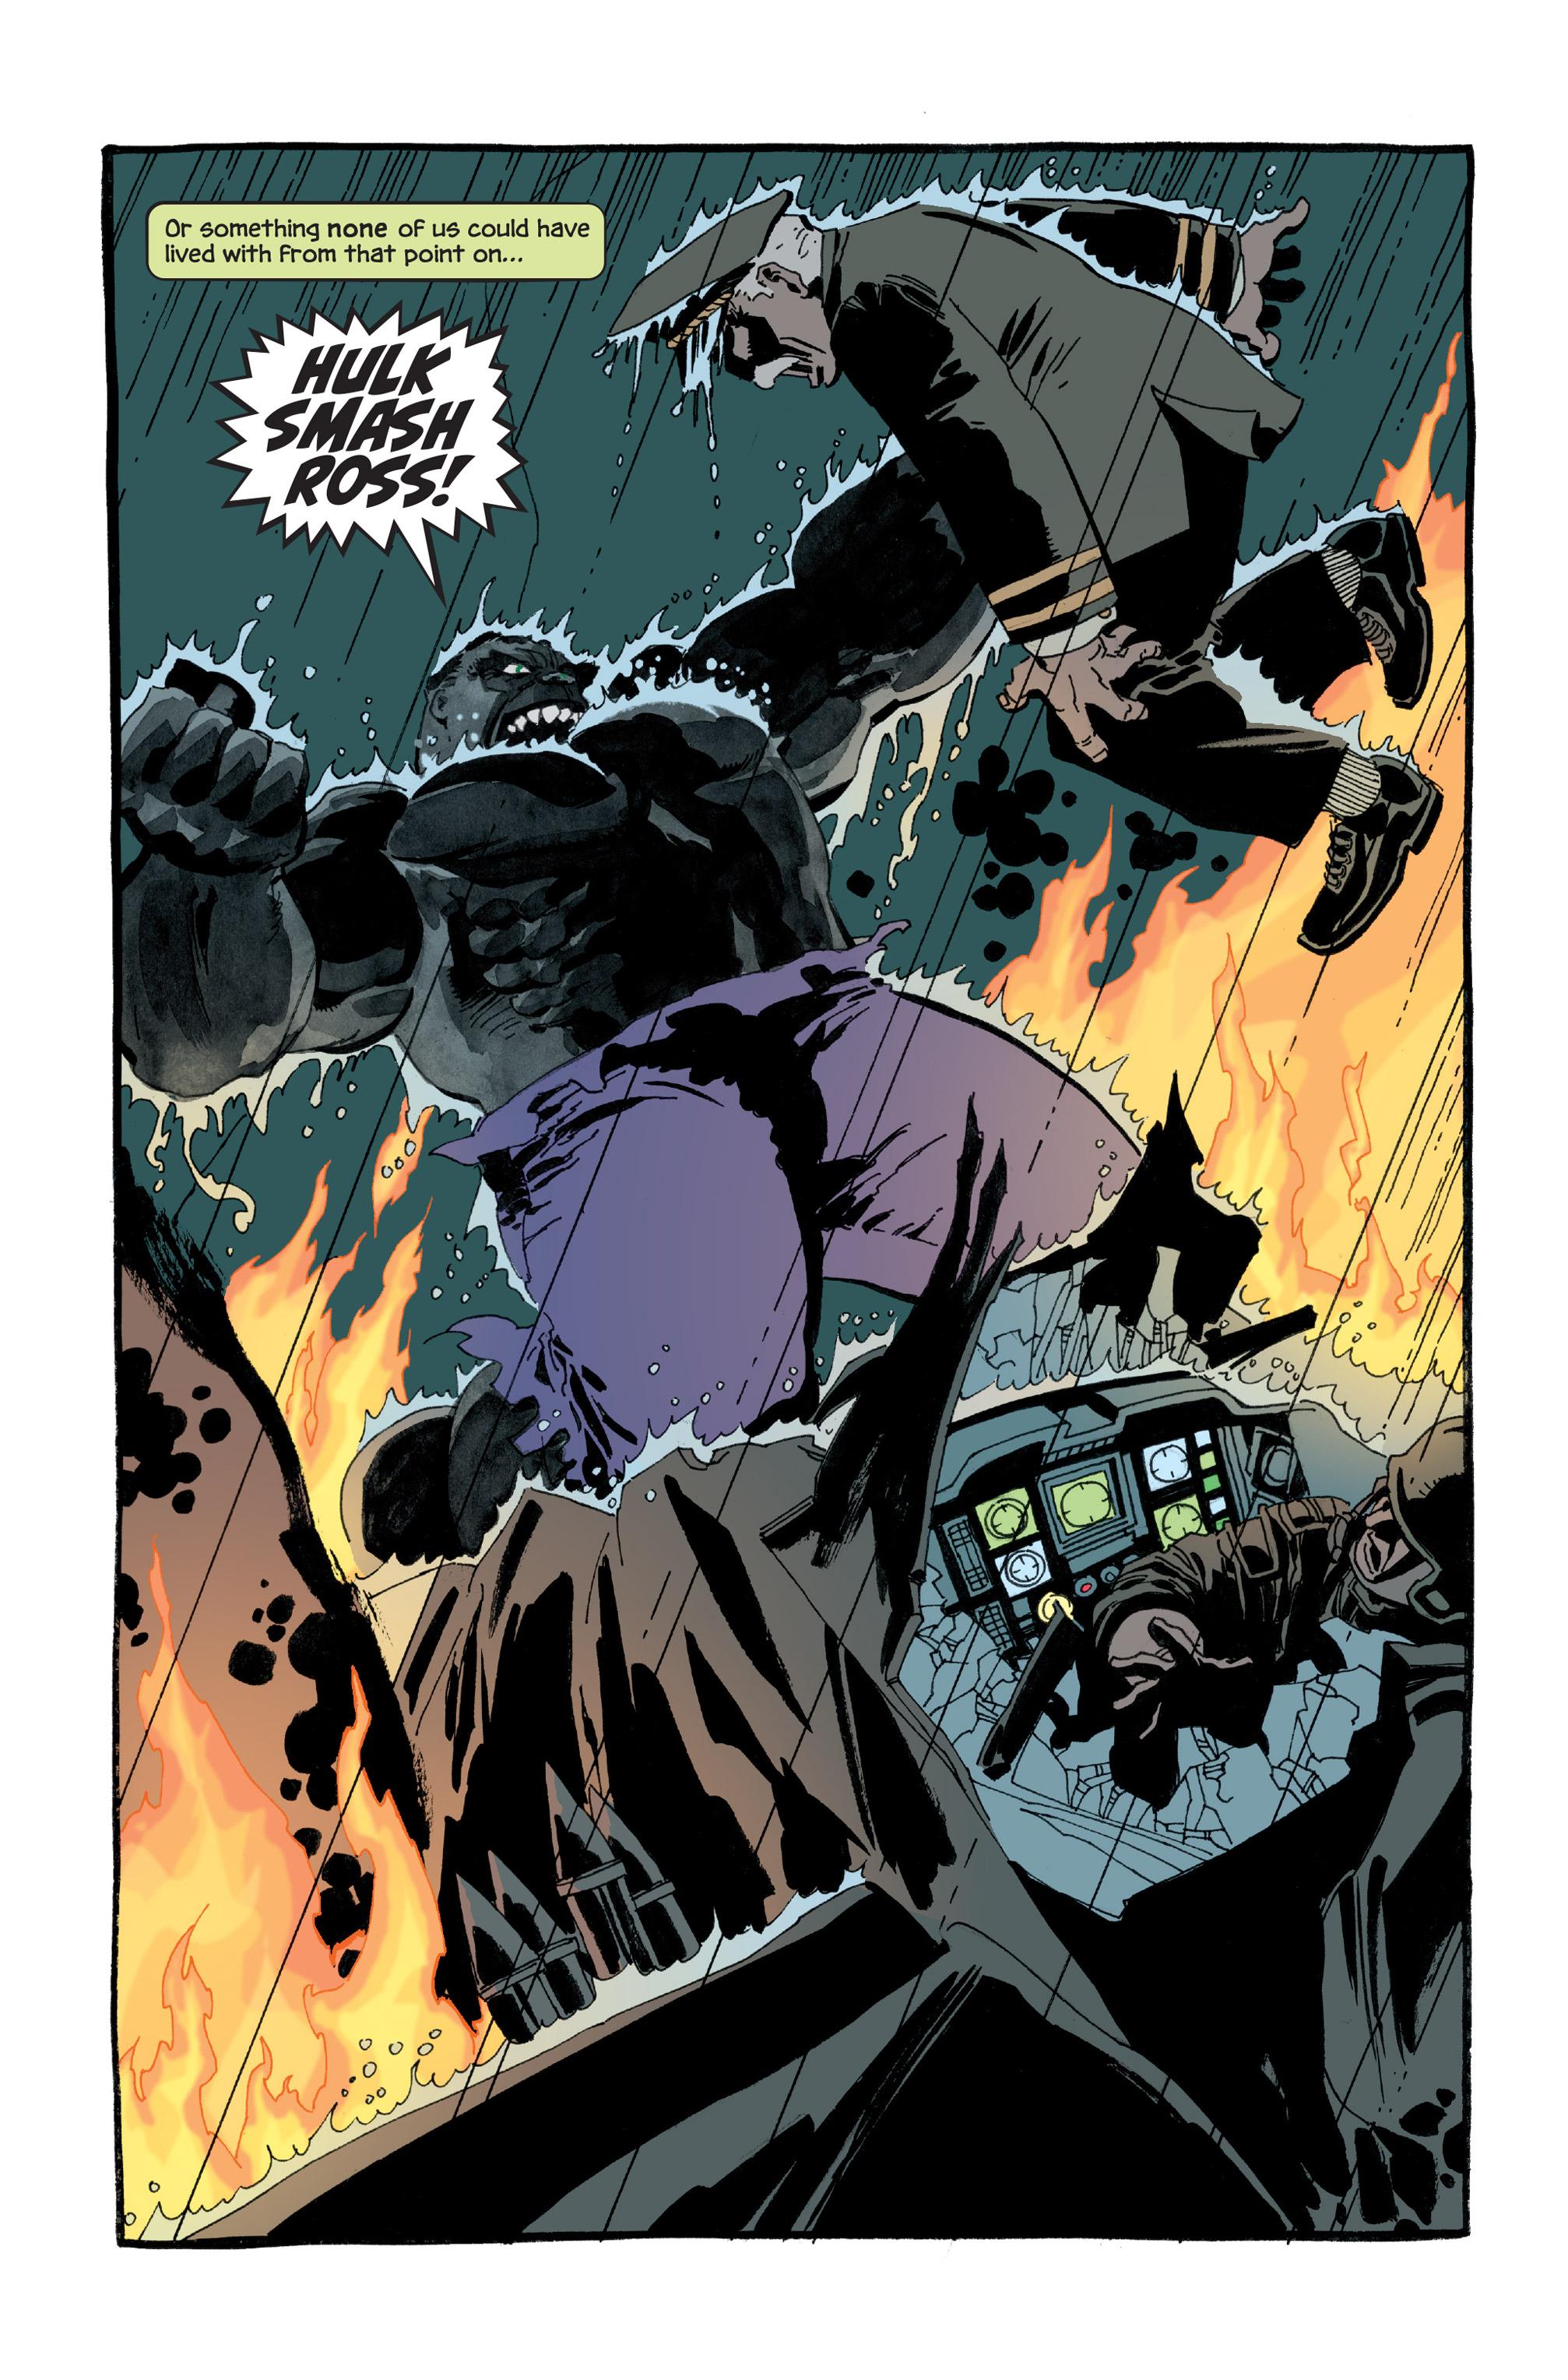 Read online Hulk: Gray comic -  Issue #6 - 7